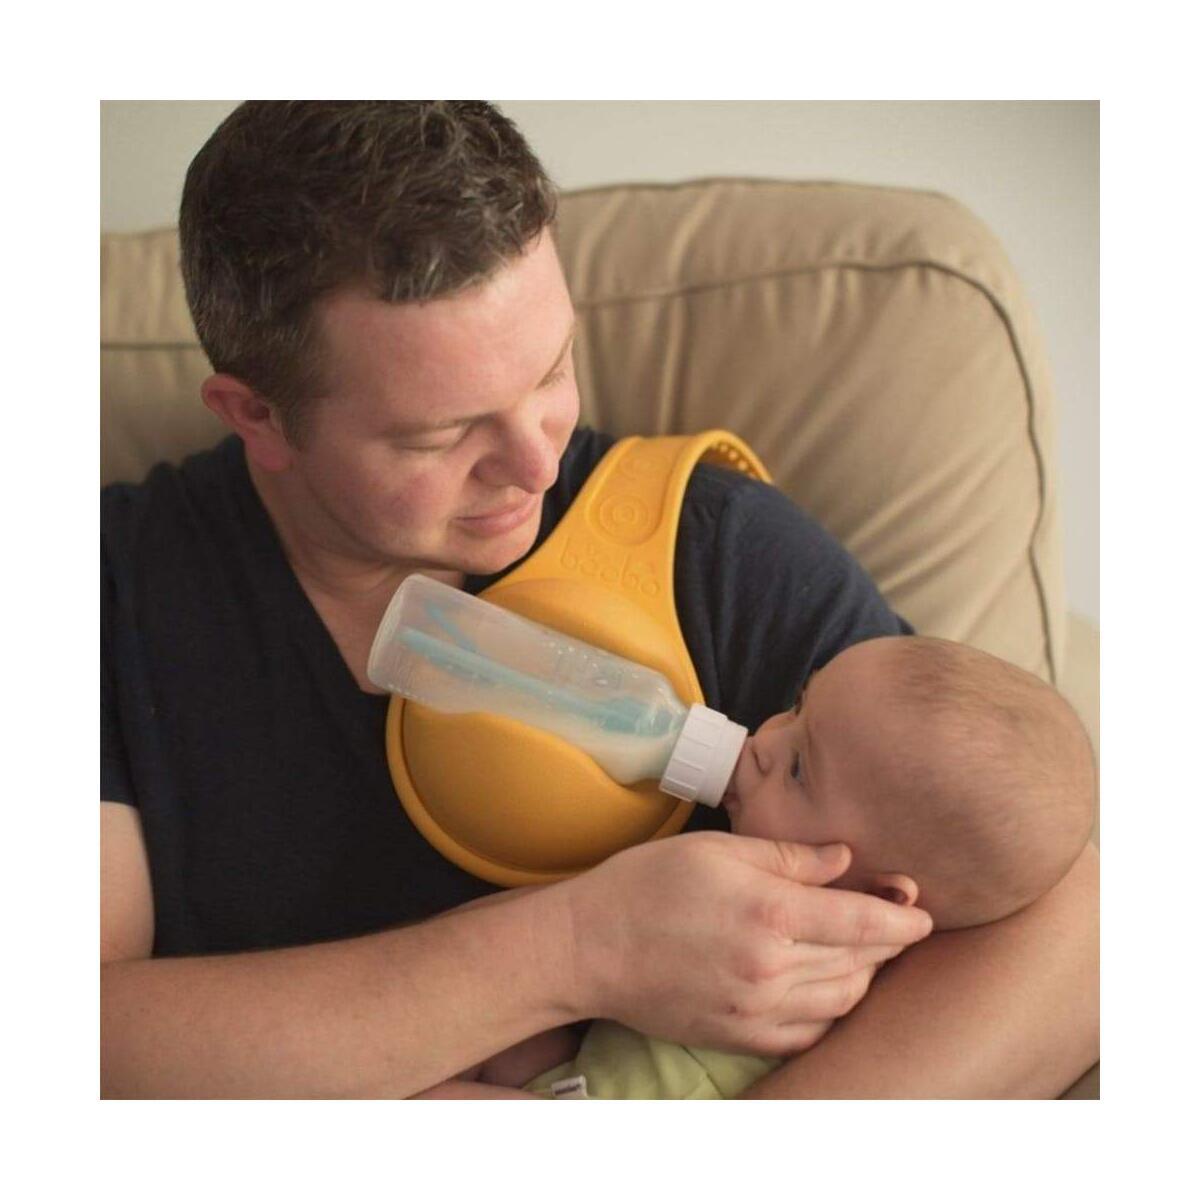 Baby Feeding Hand Free Babies Bottle Holder Strap Leash Hands Stroller Tools Baby Feeding Feeding Fixing Bracket